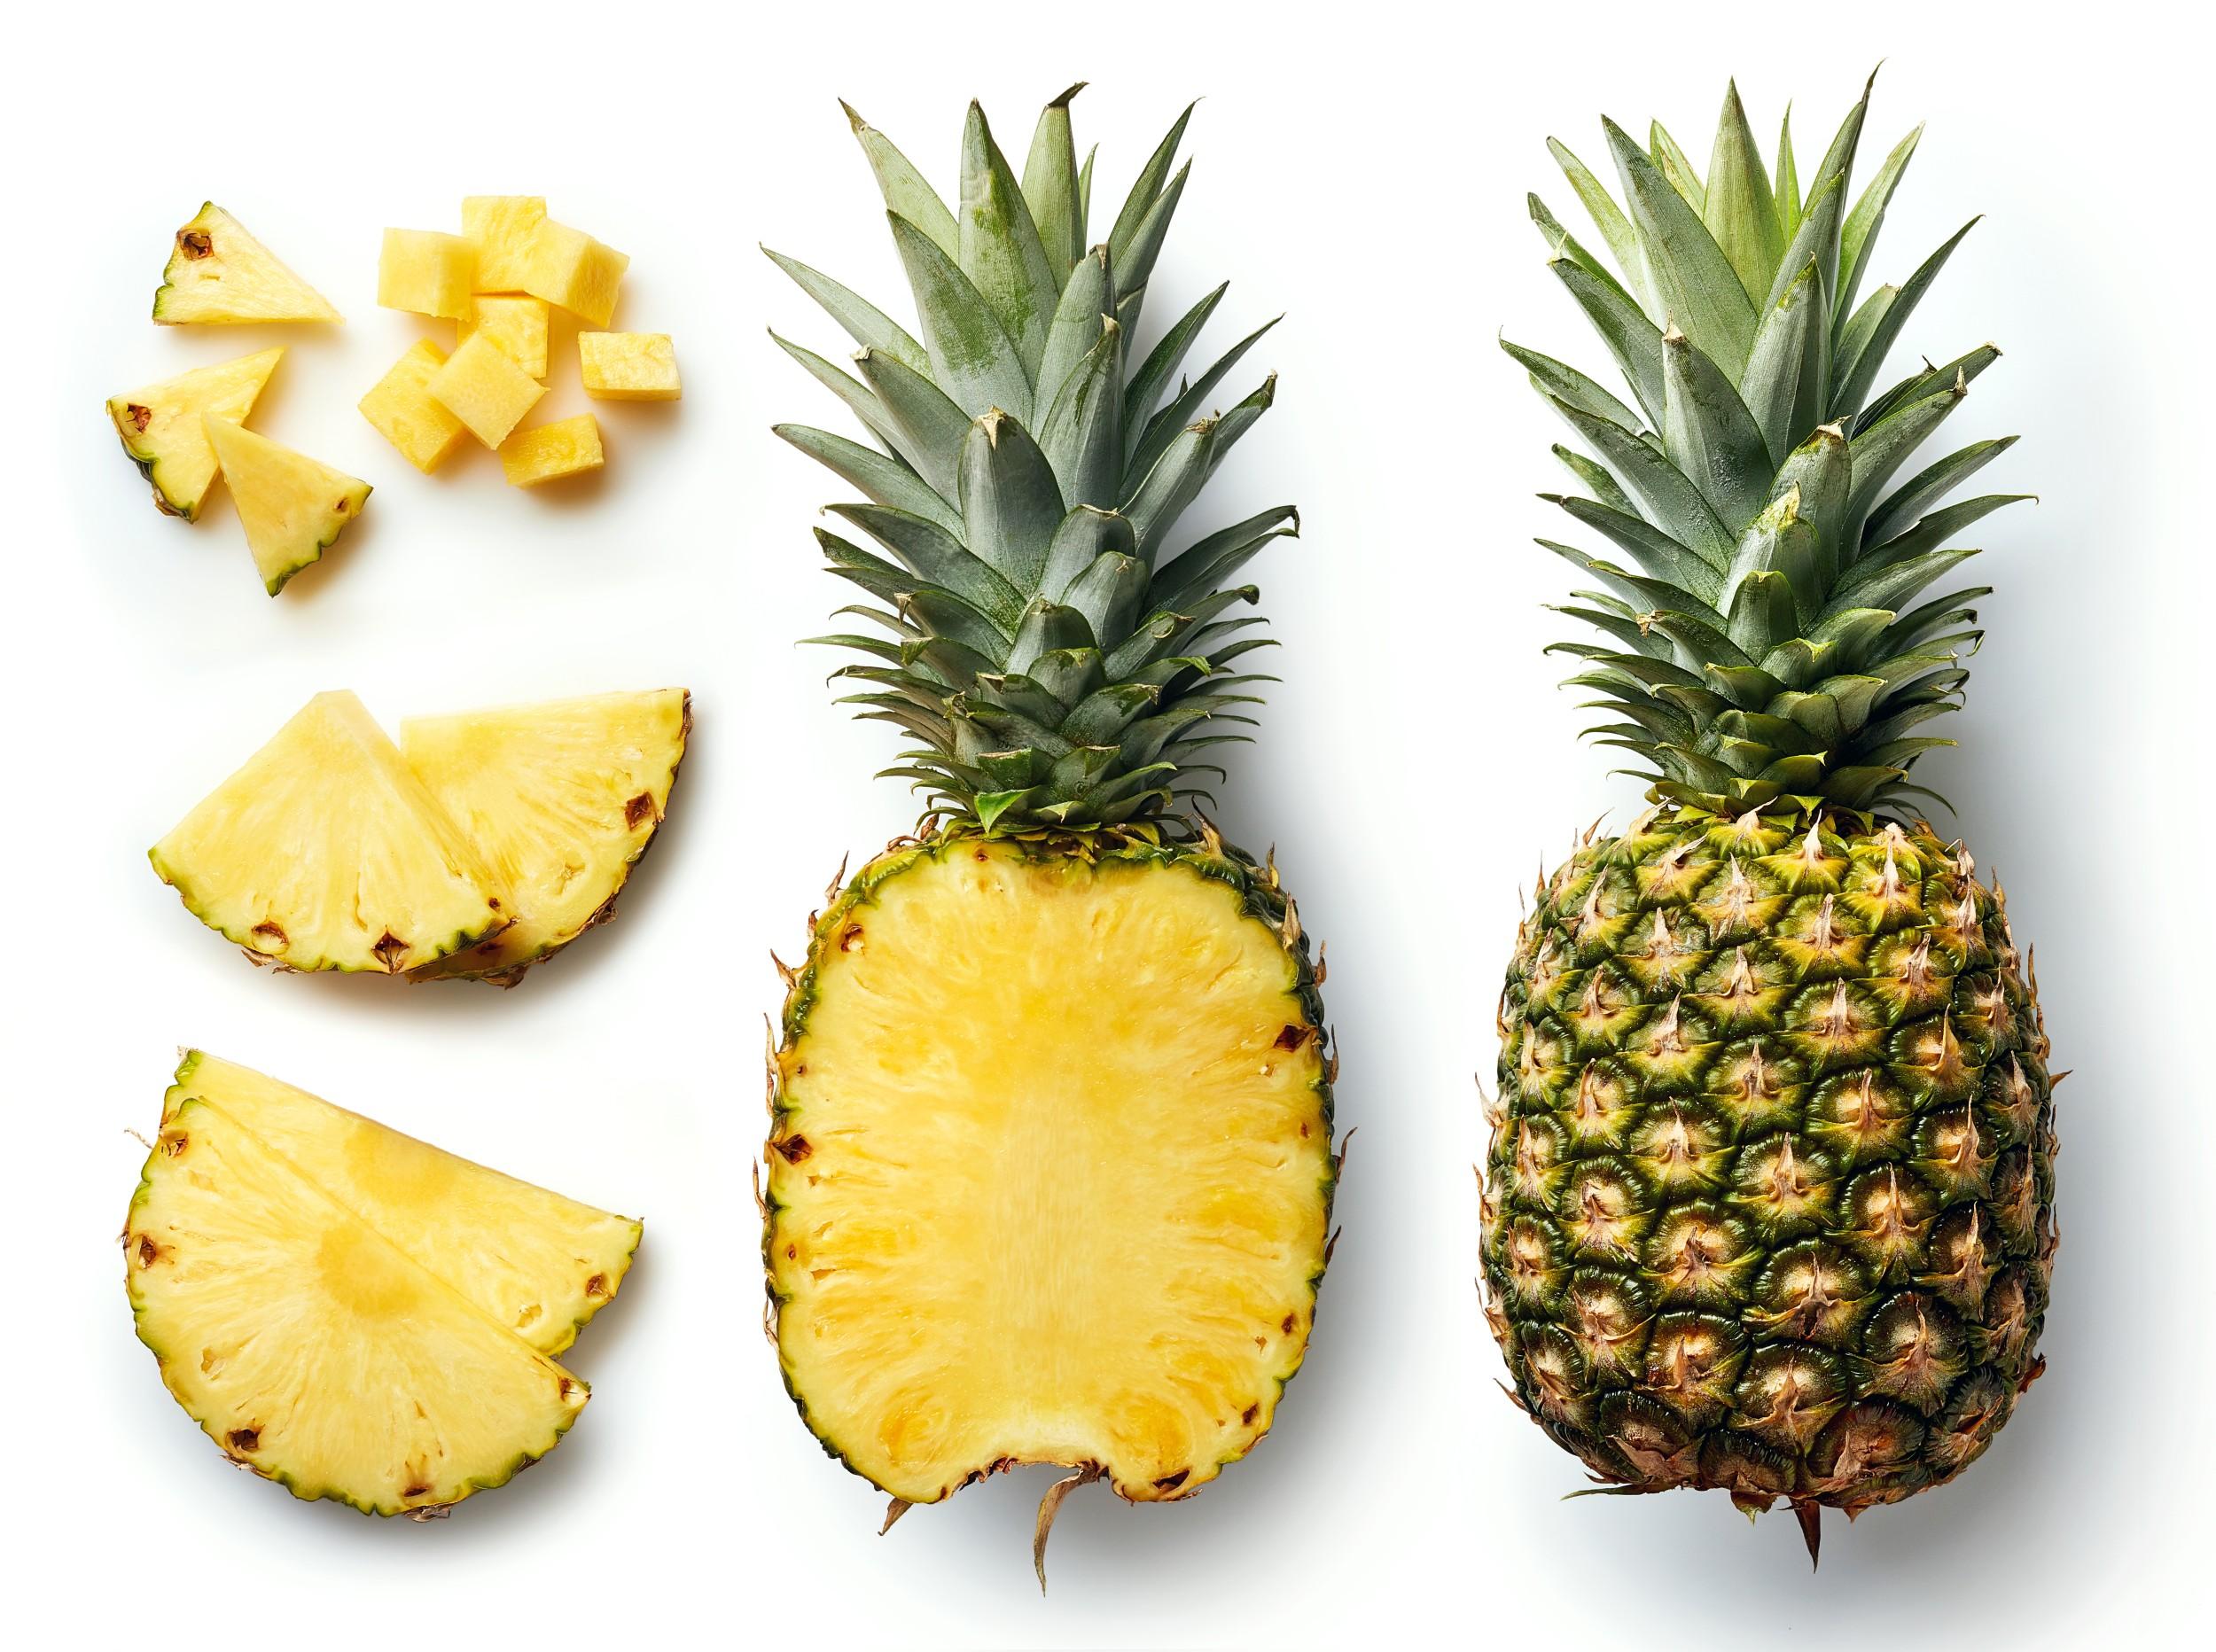 Abacaxi anan s frutas infoescola - Conservation ananas coupe ...